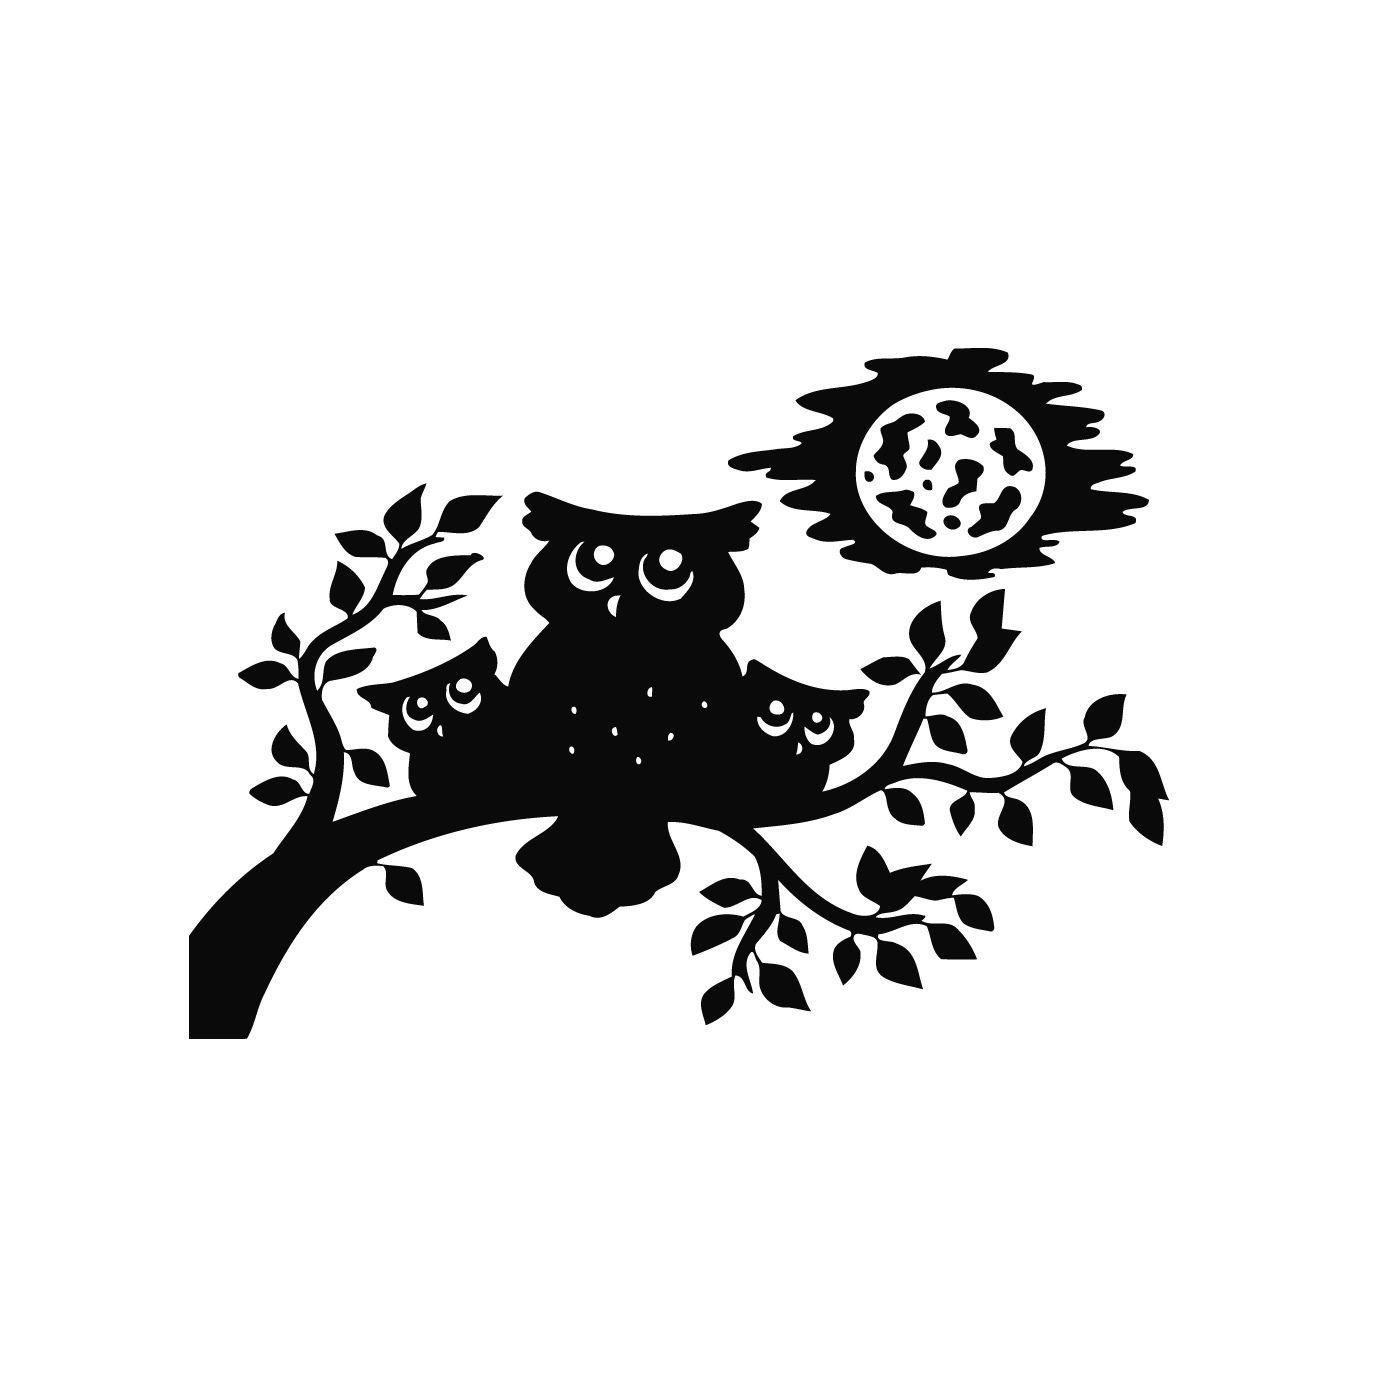 Baby Owls Sitting On Tree Vinyl Wall Art